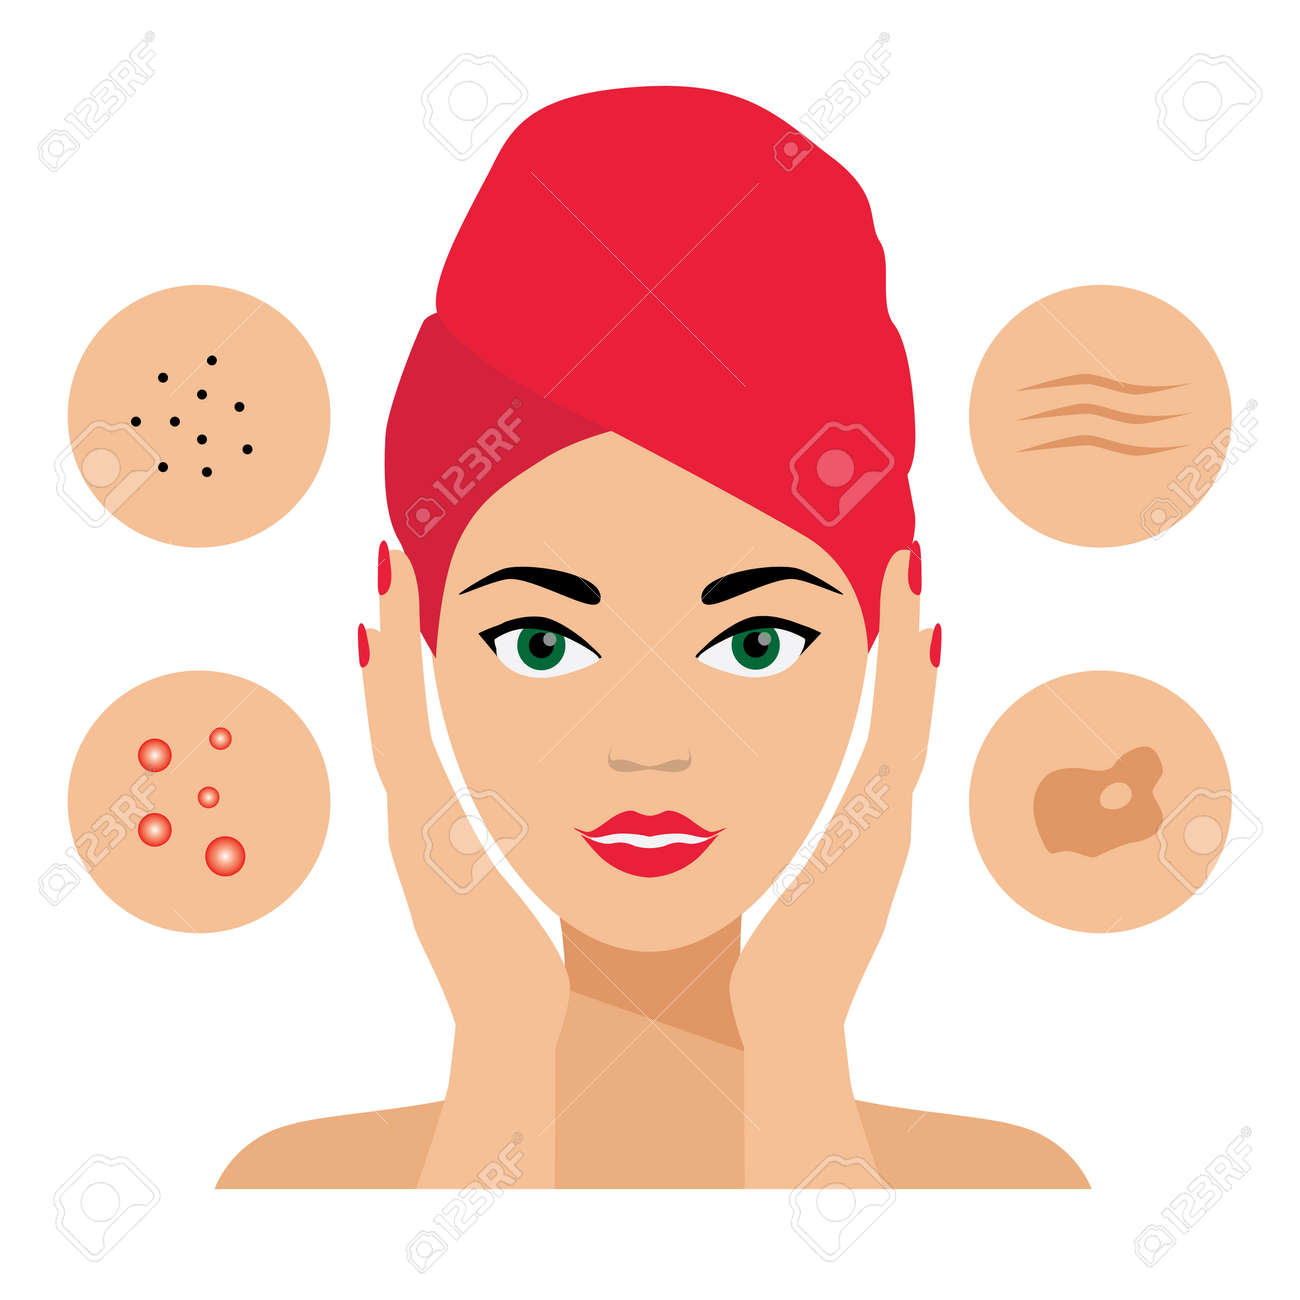 Facial Care, Skin Defects  Skin Problems, Acne, Seborrhea, Seborrheic